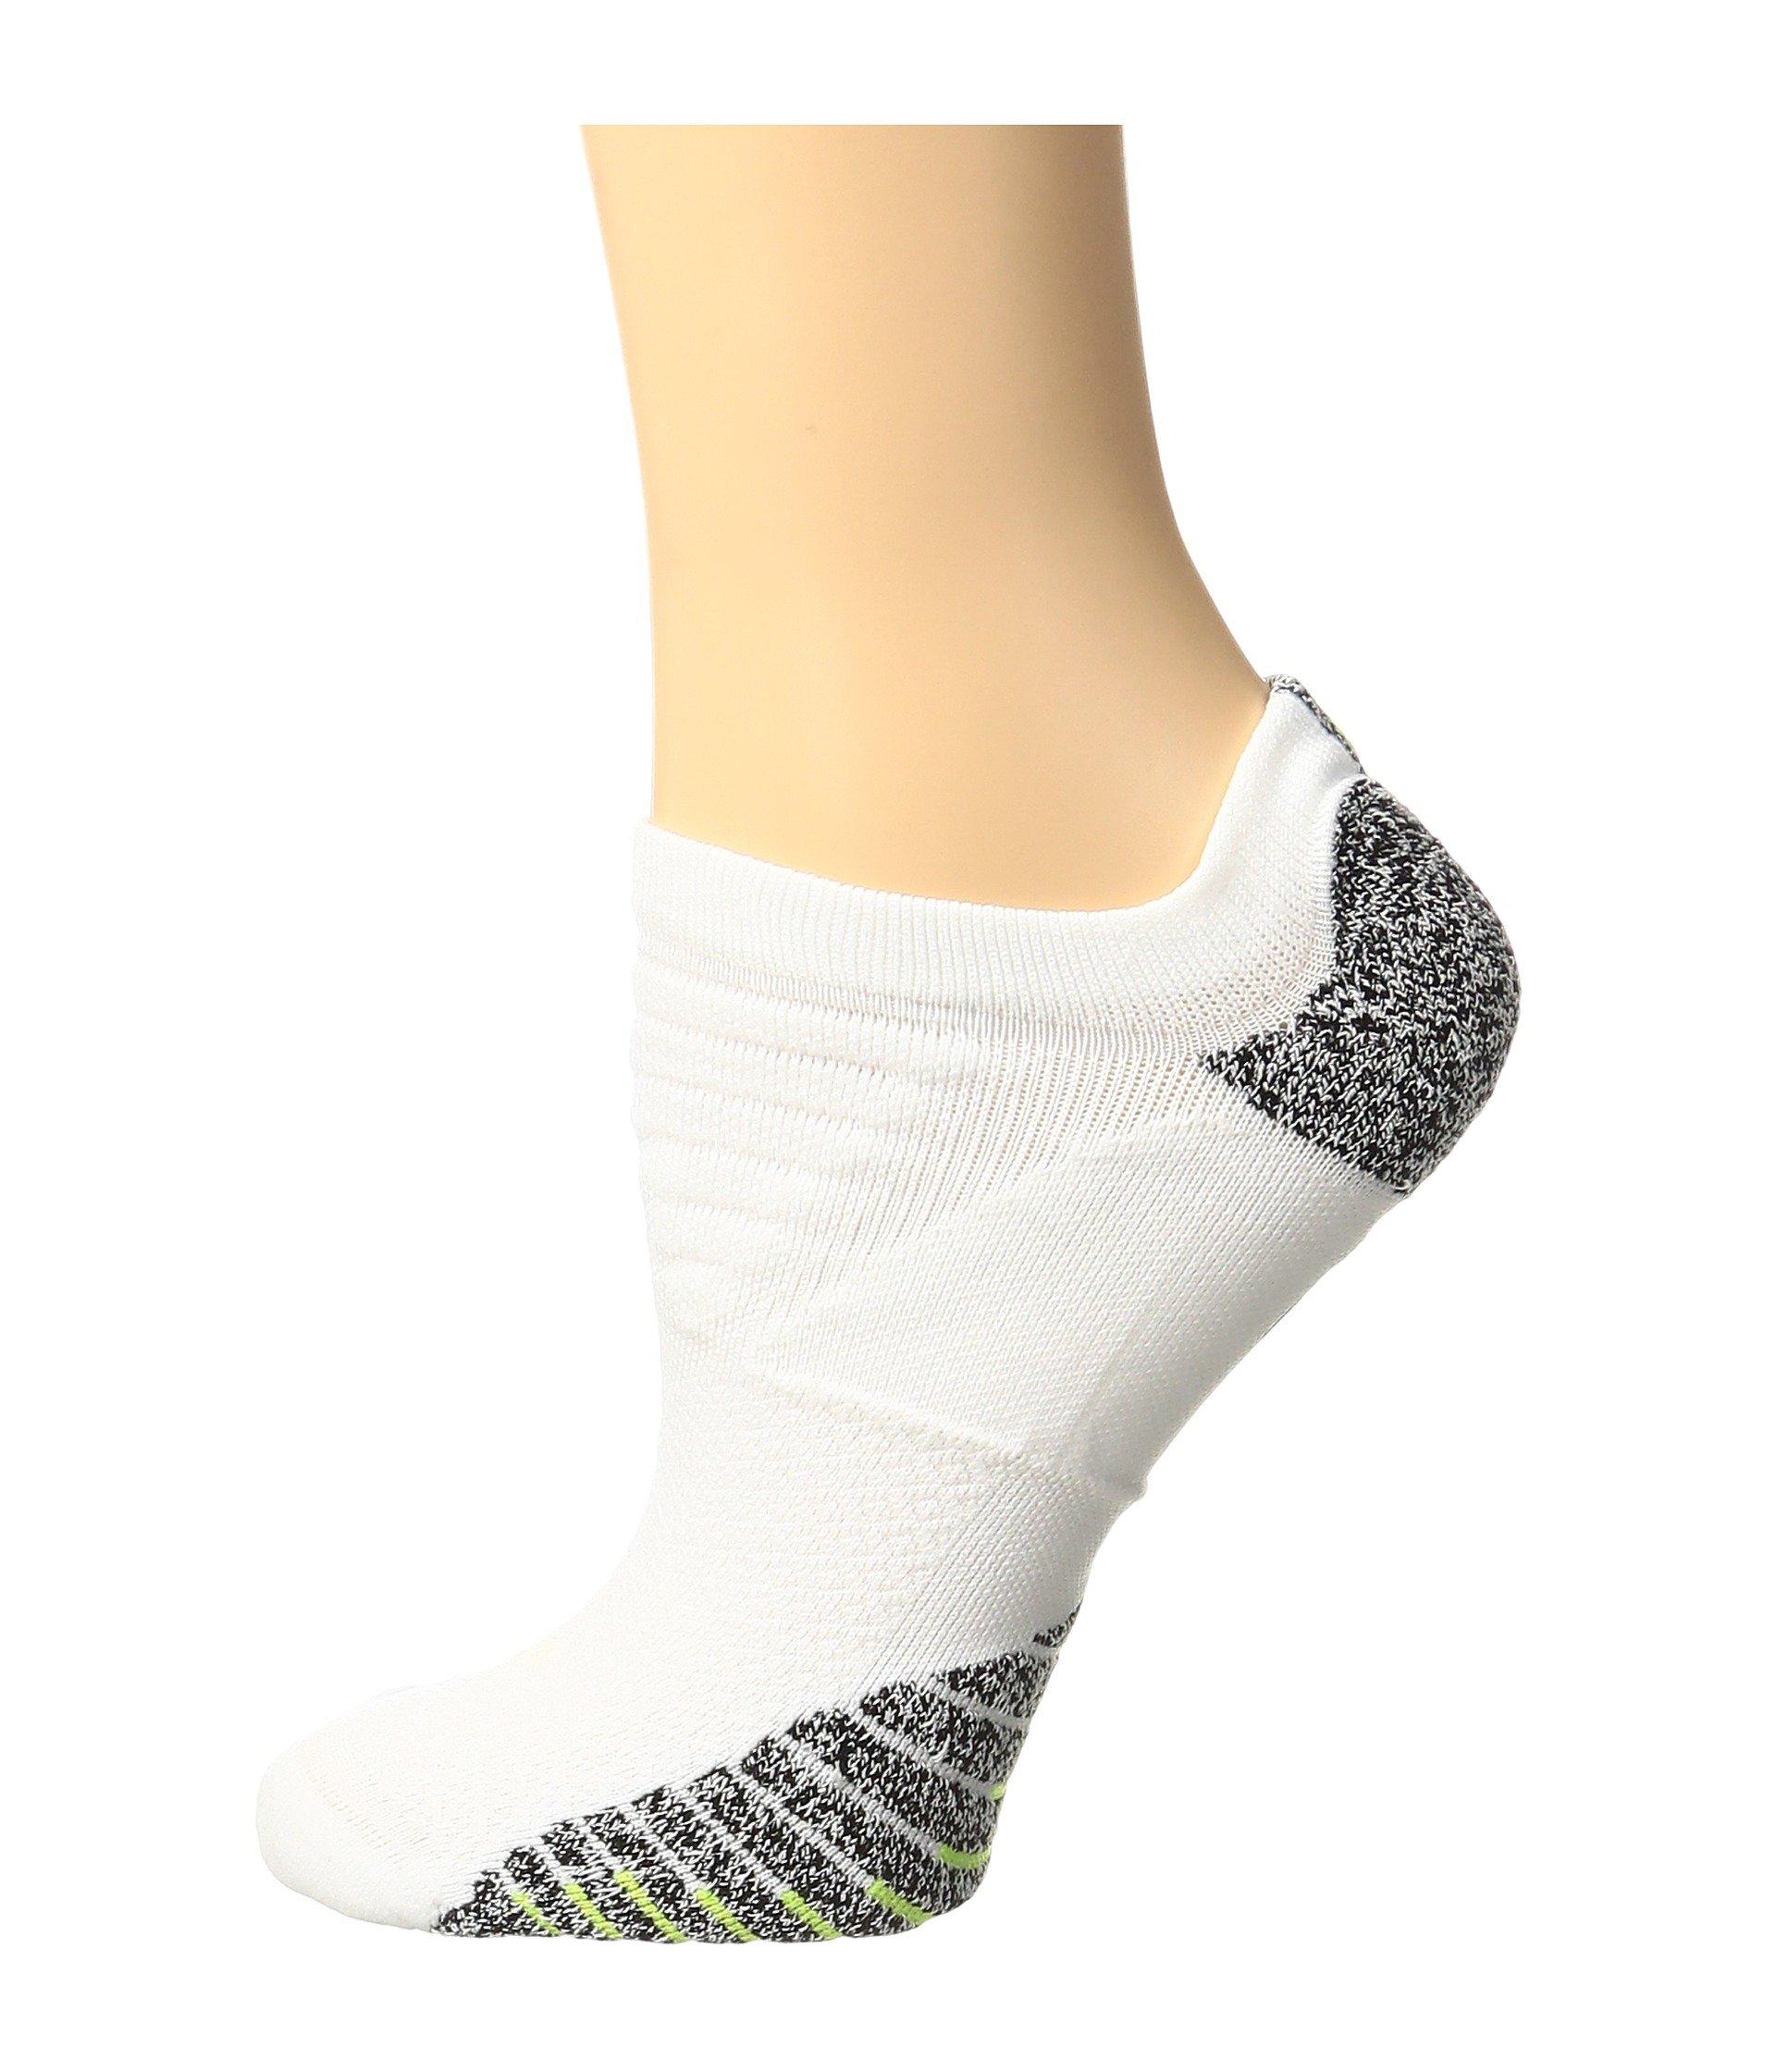 3ce07713258ea Nikegrip Lightweight No Show Training Socks, White/Black/Volt